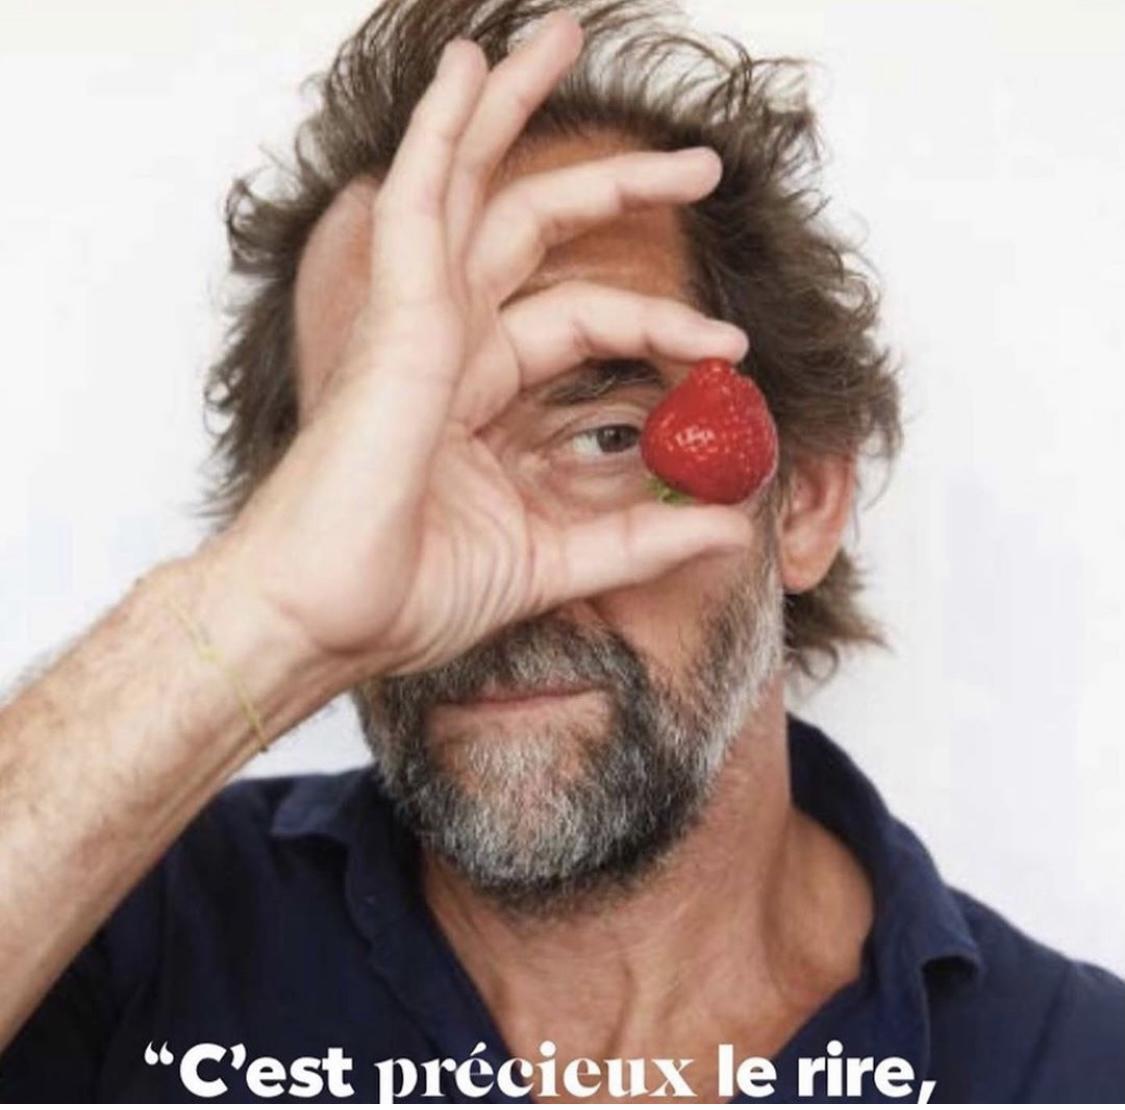 Merci Stéphane De Groodt